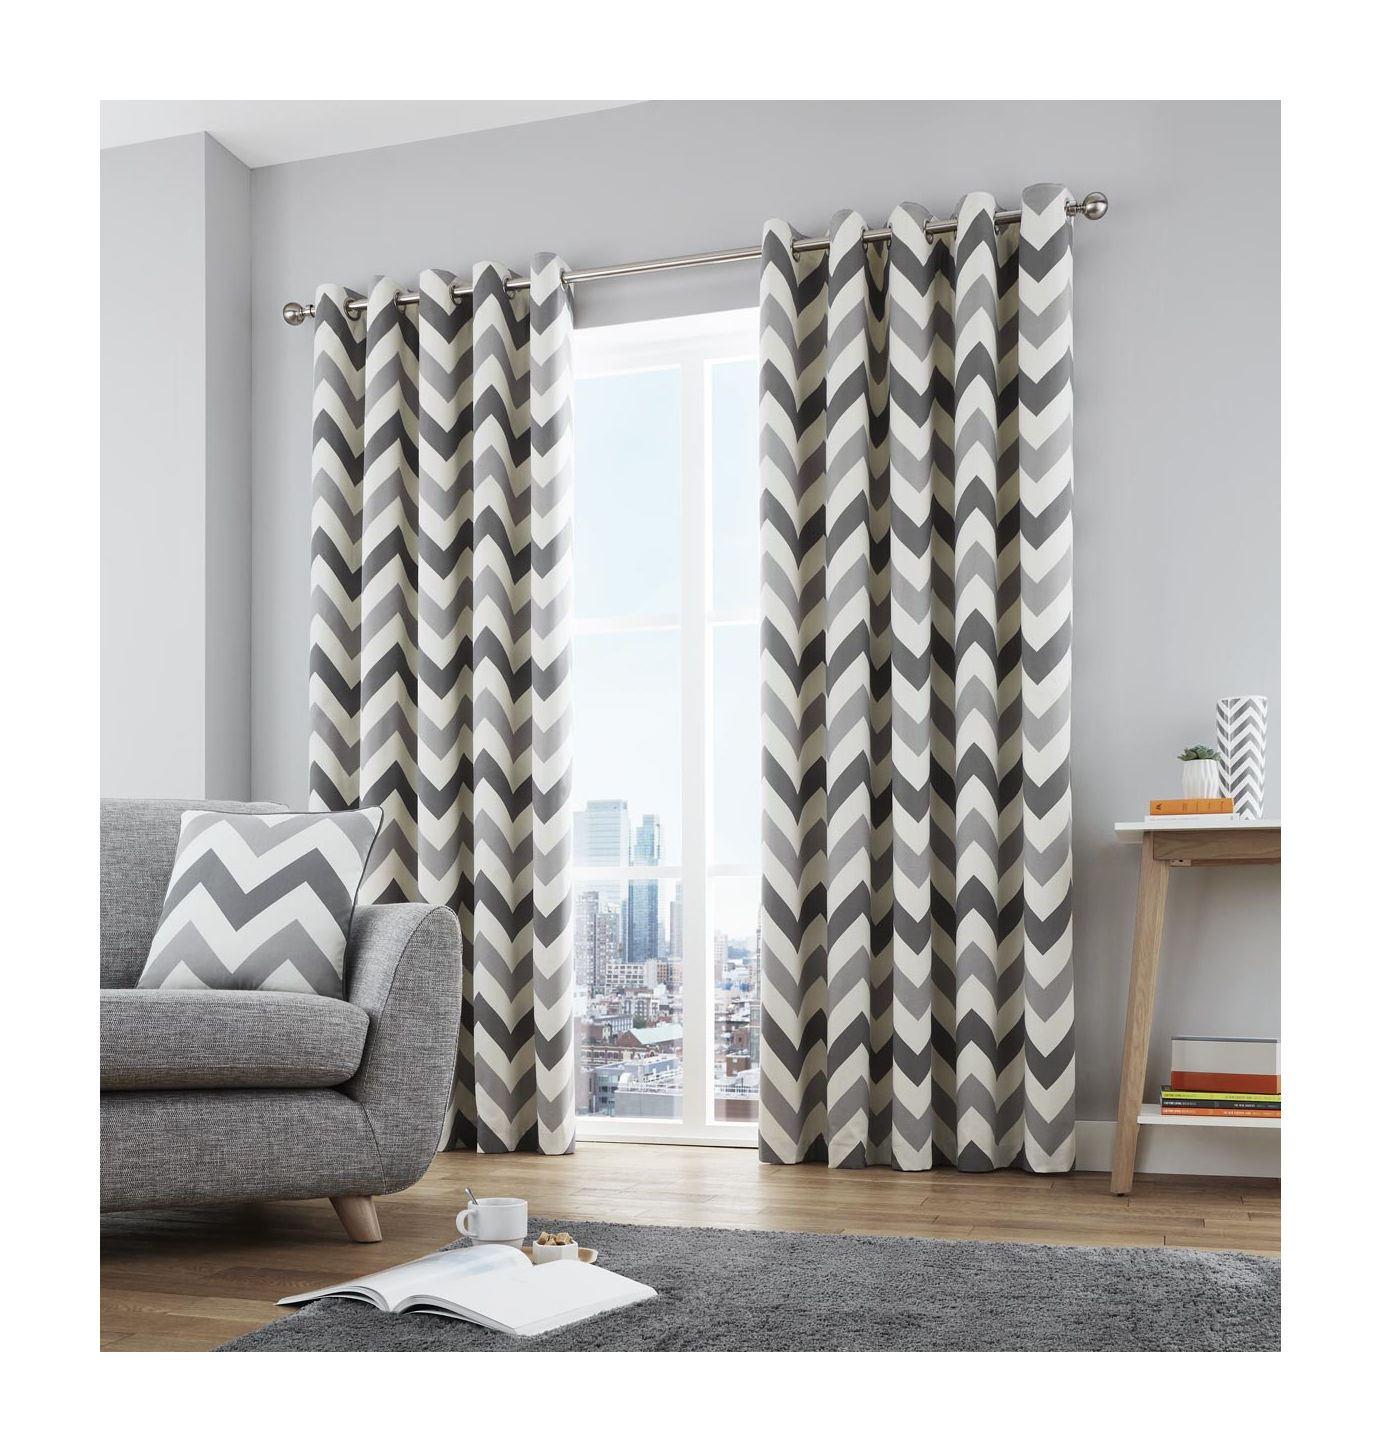 Zig Zag Chevron Grey Cream Fully Lined Ring Top Curtains 7 Sizes Ebay